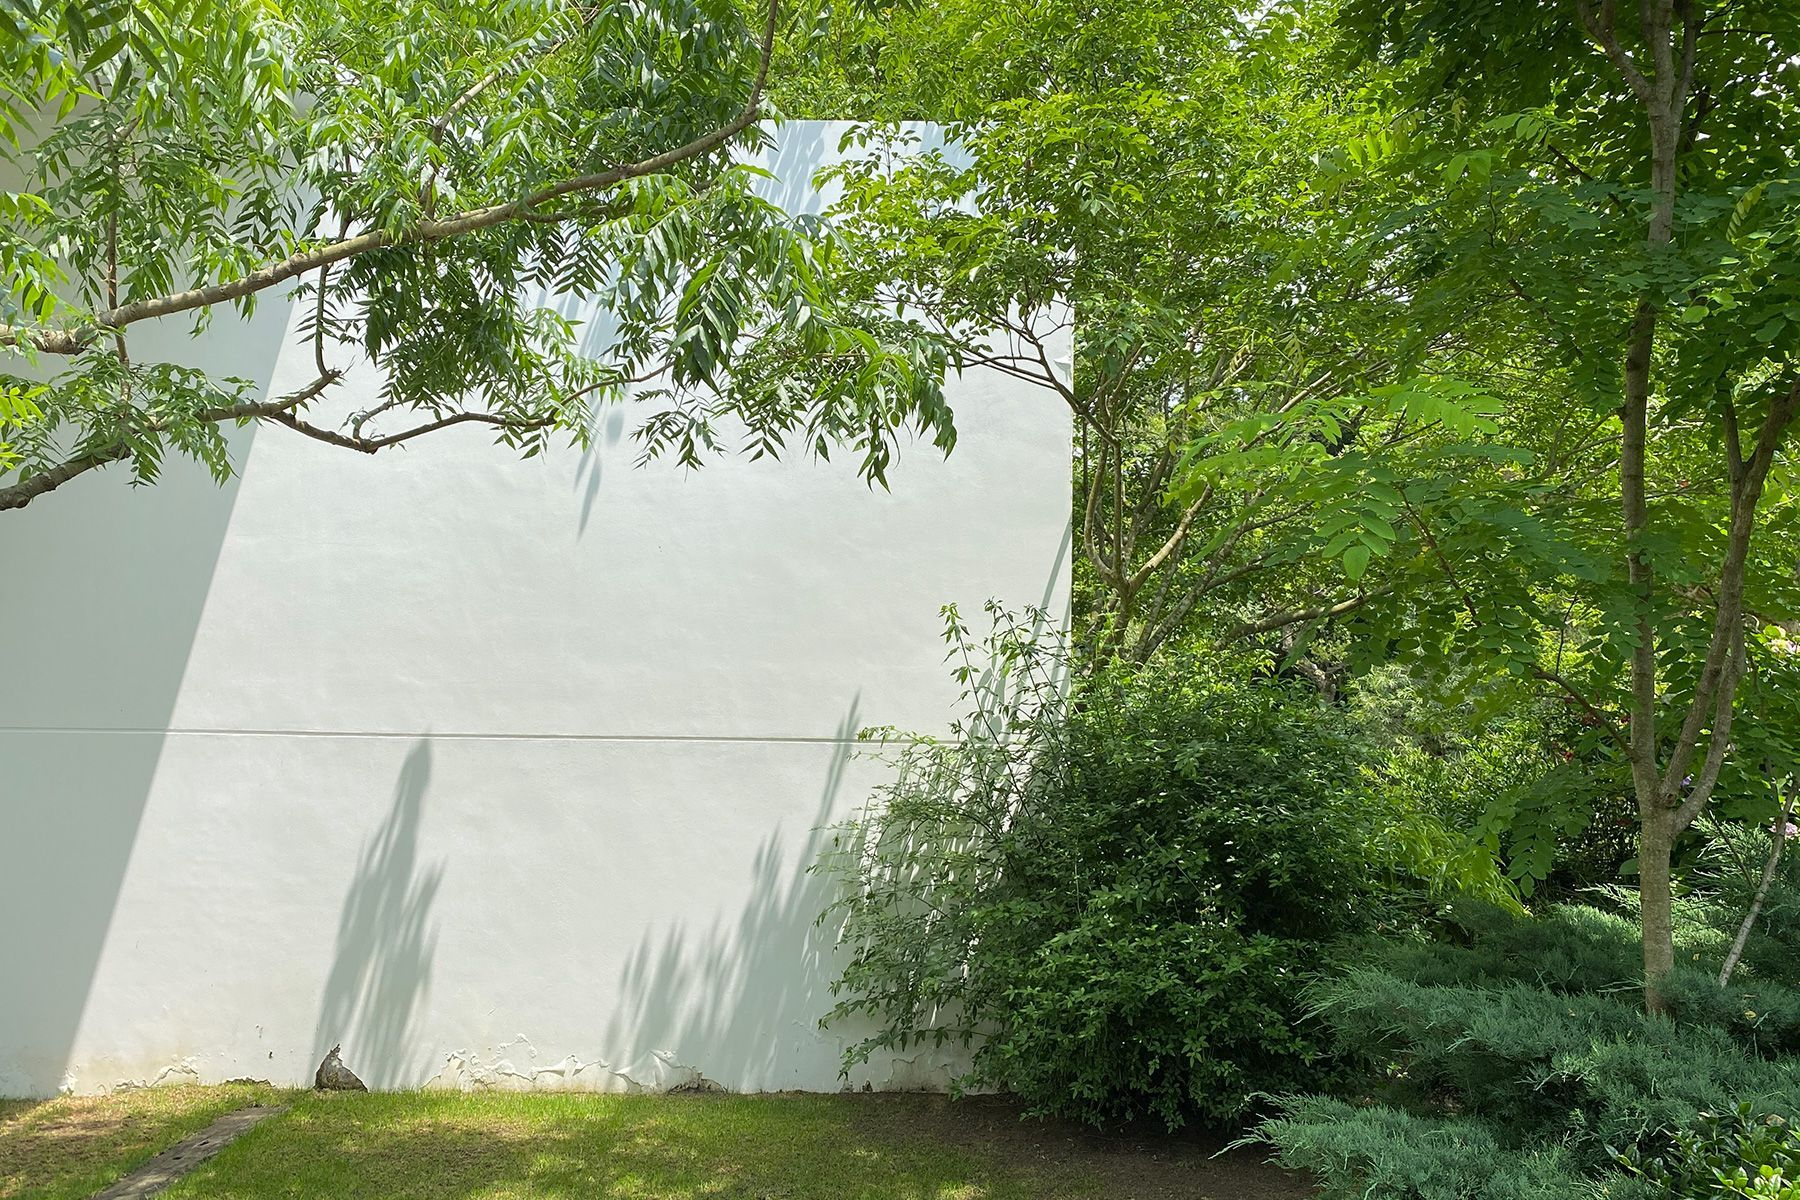 studio ogawasanchi スタジオ 小川さん家2019.1月 現在は、芝生